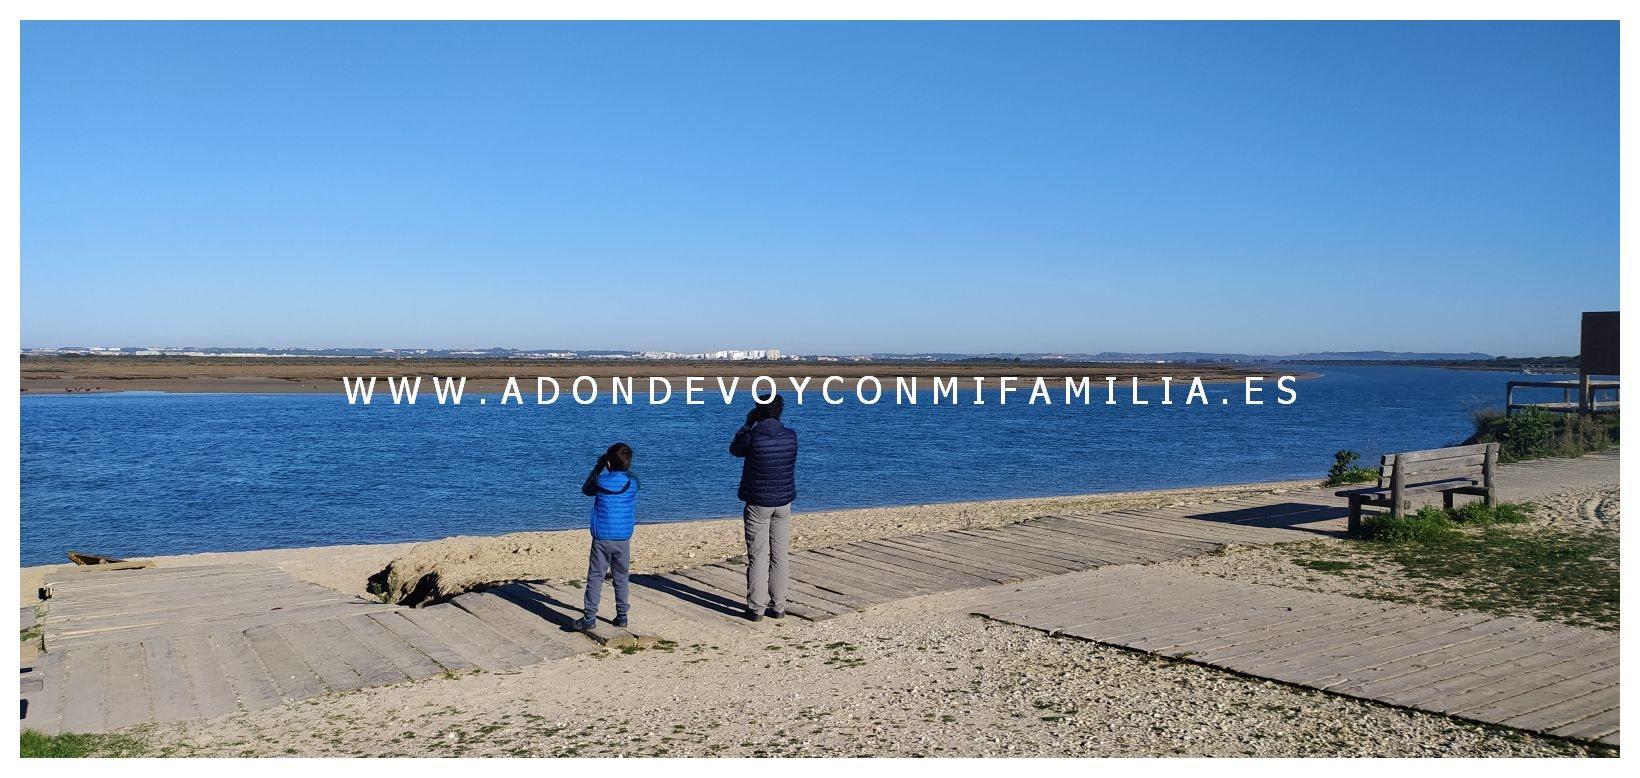 playa-rio-san-pedro-Adondevoyconmifamilia-03